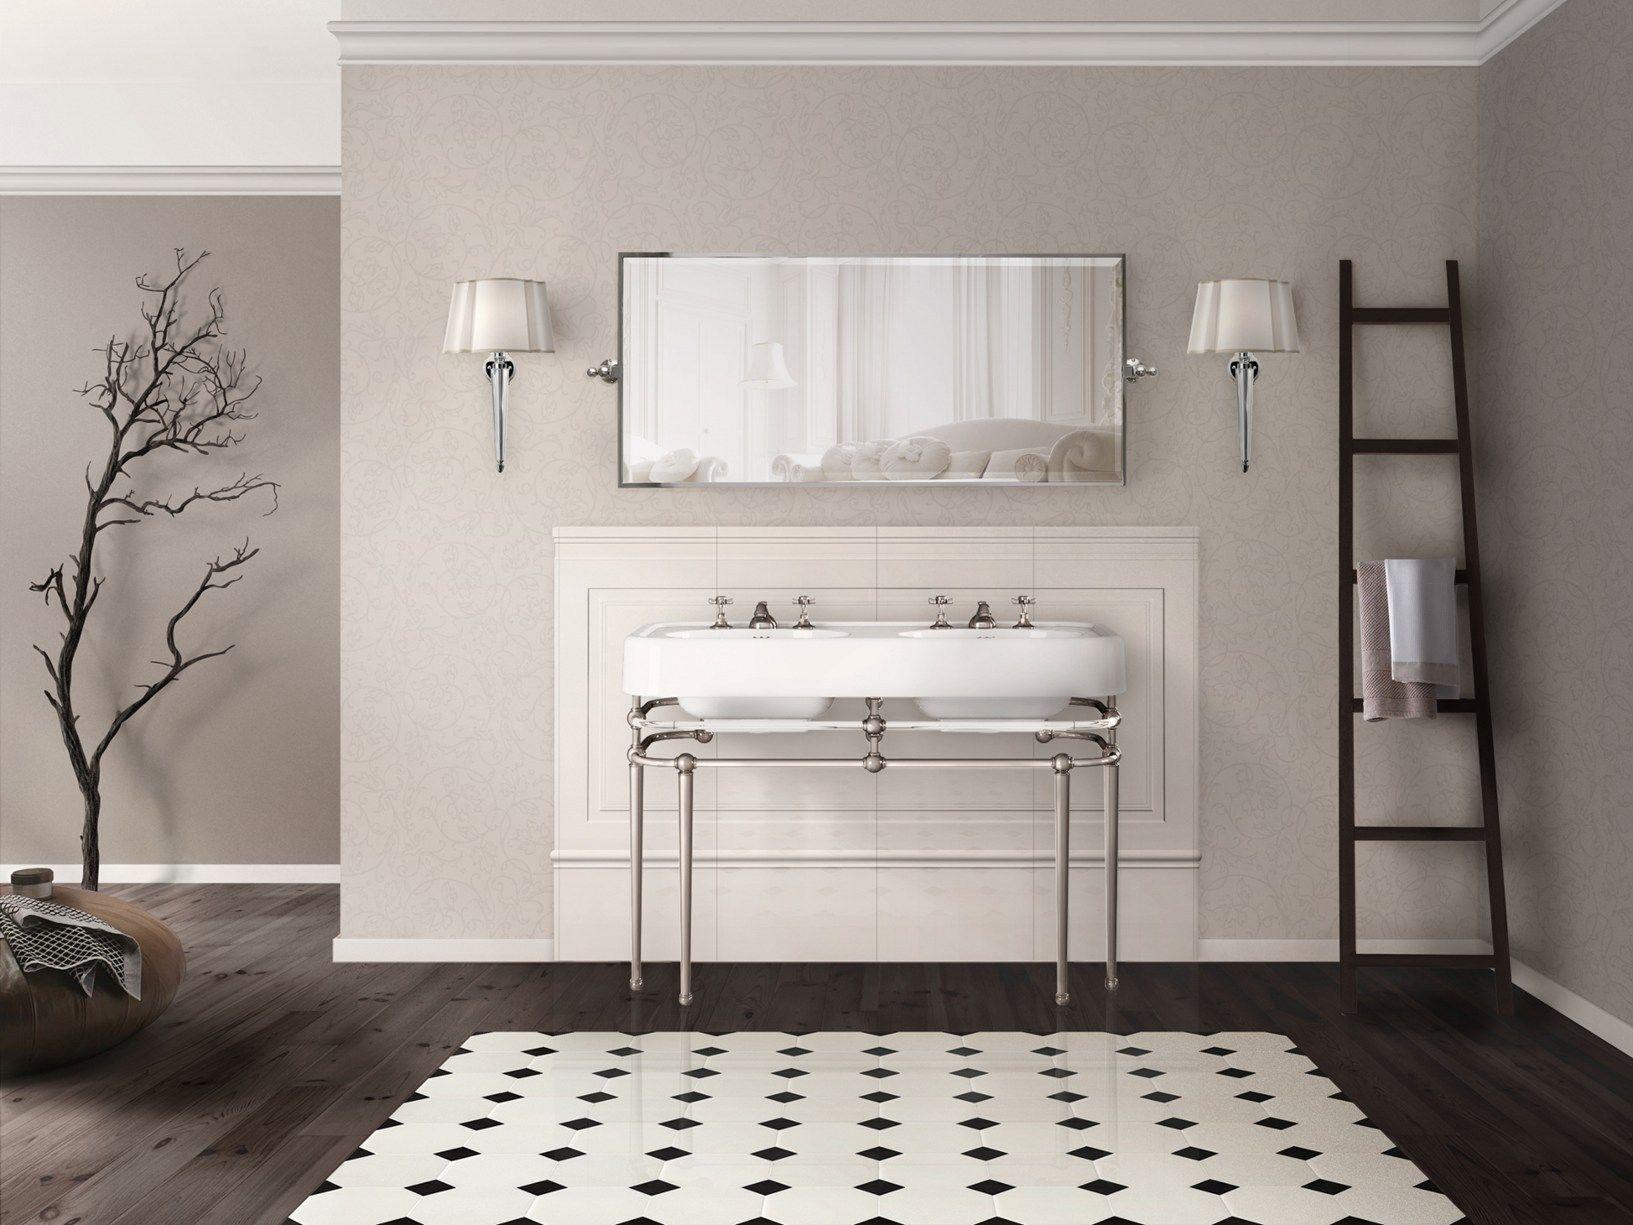 contemporary d cor devon devon new york. Black Bedroom Furniture Sets. Home Design Ideas